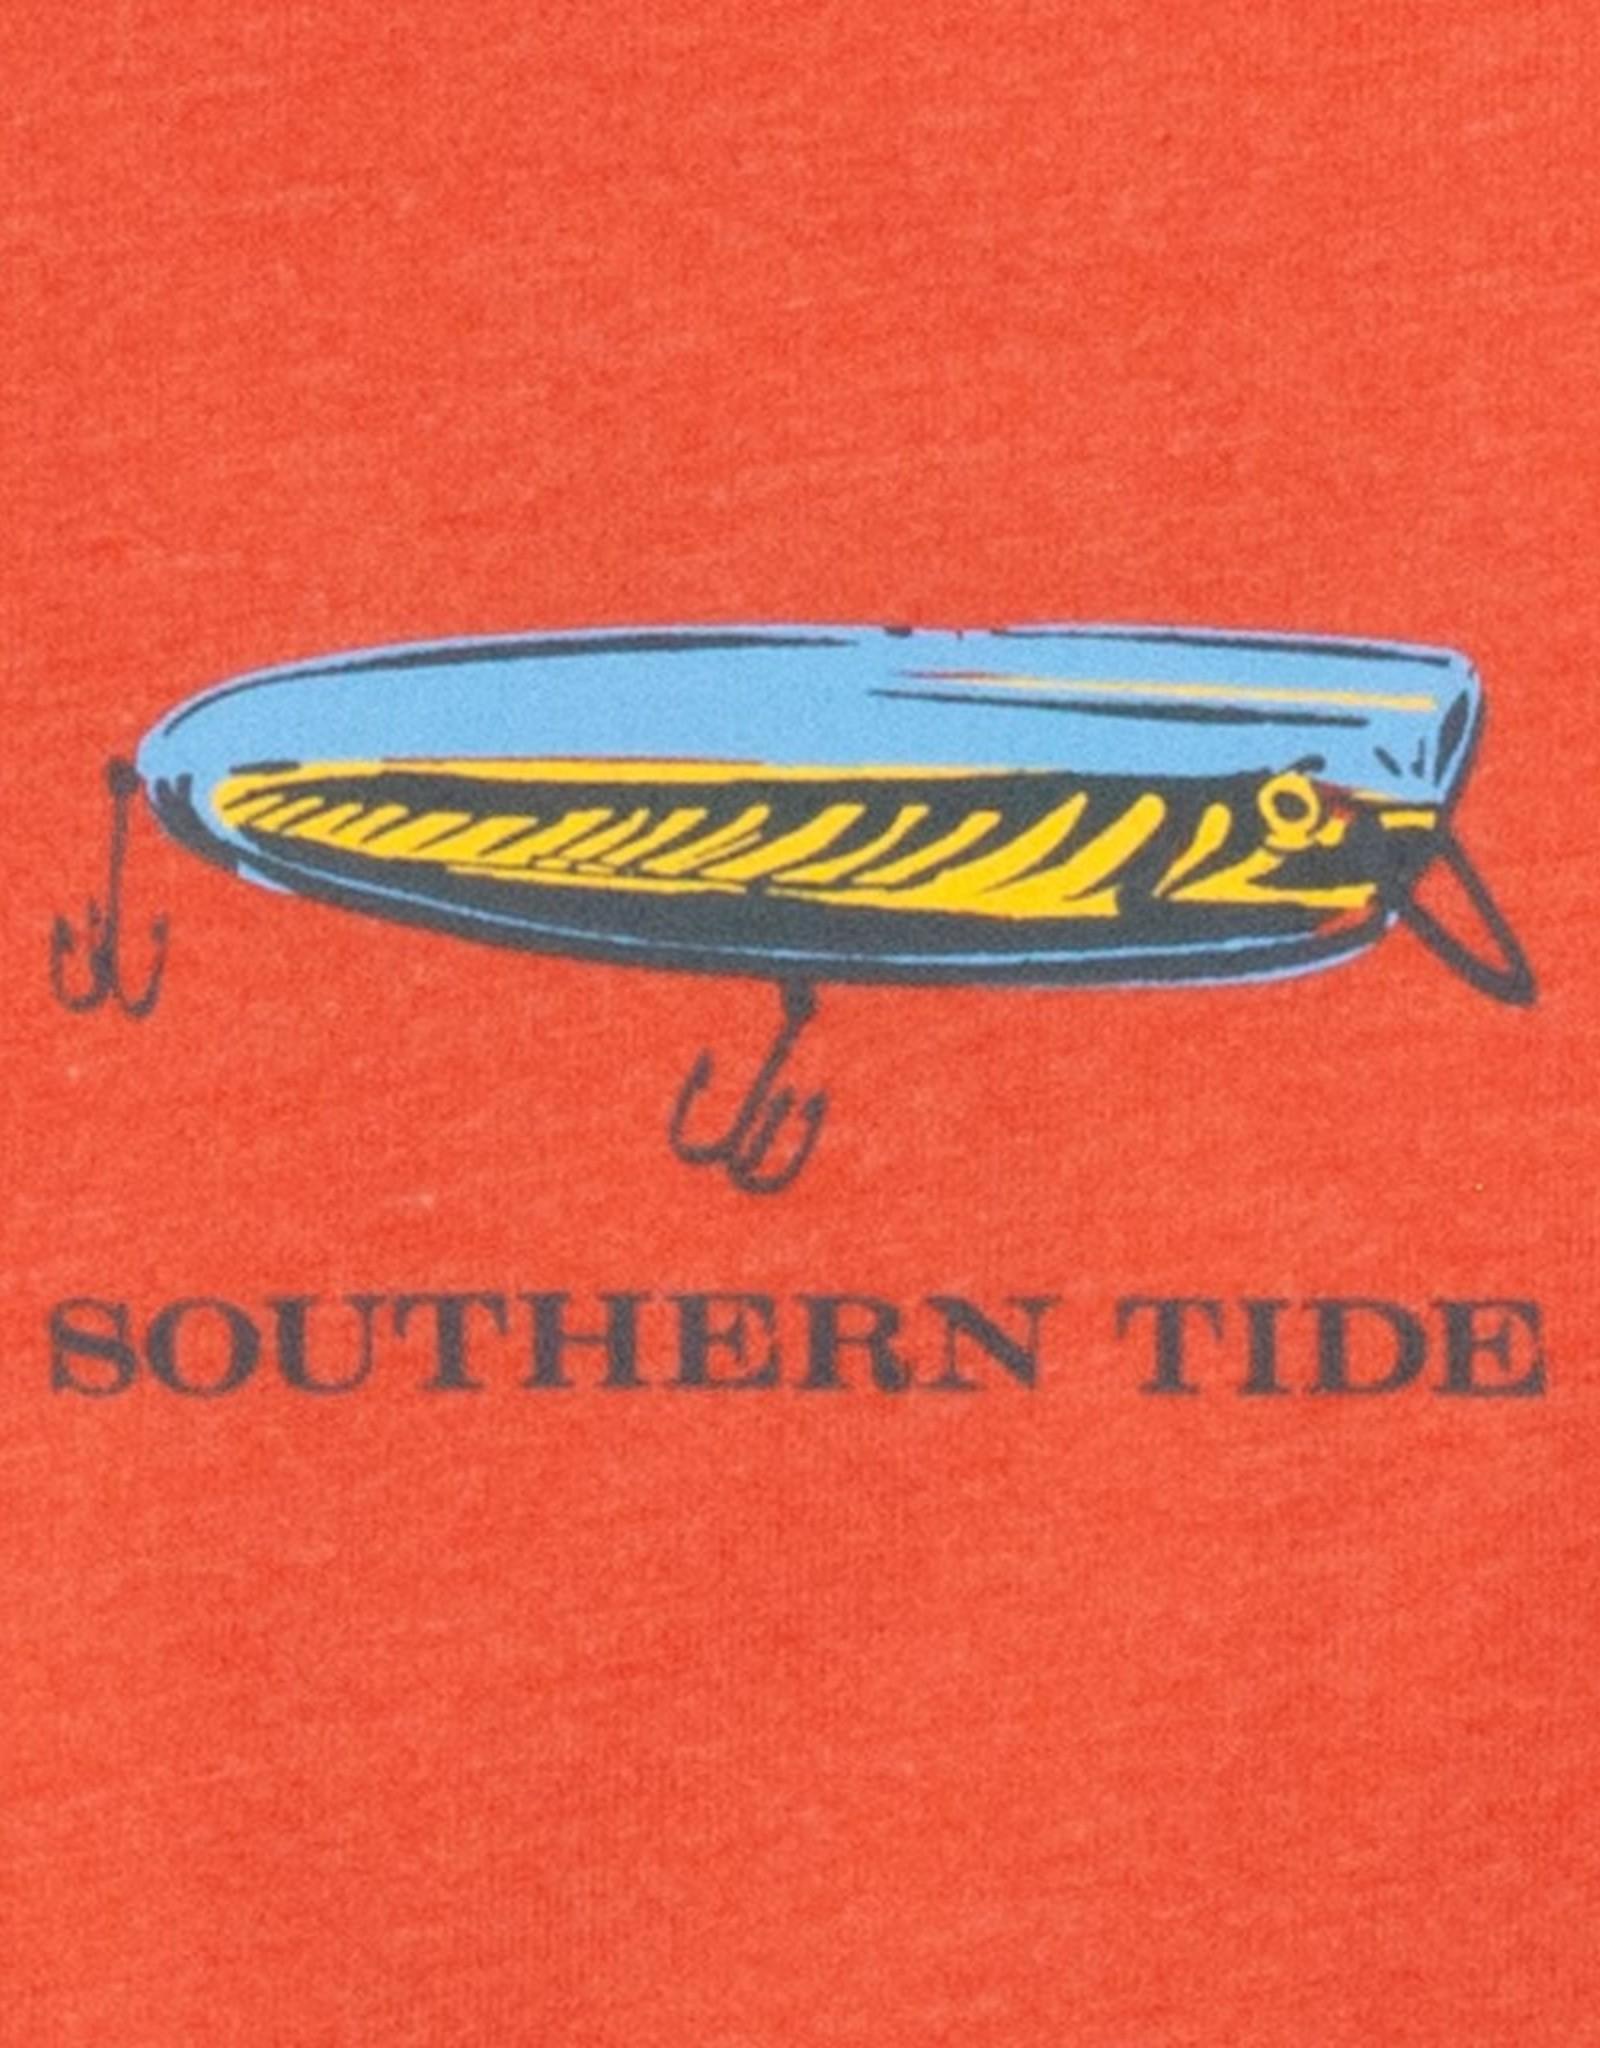 Southern Tide SkipJack Lure Shop Tee